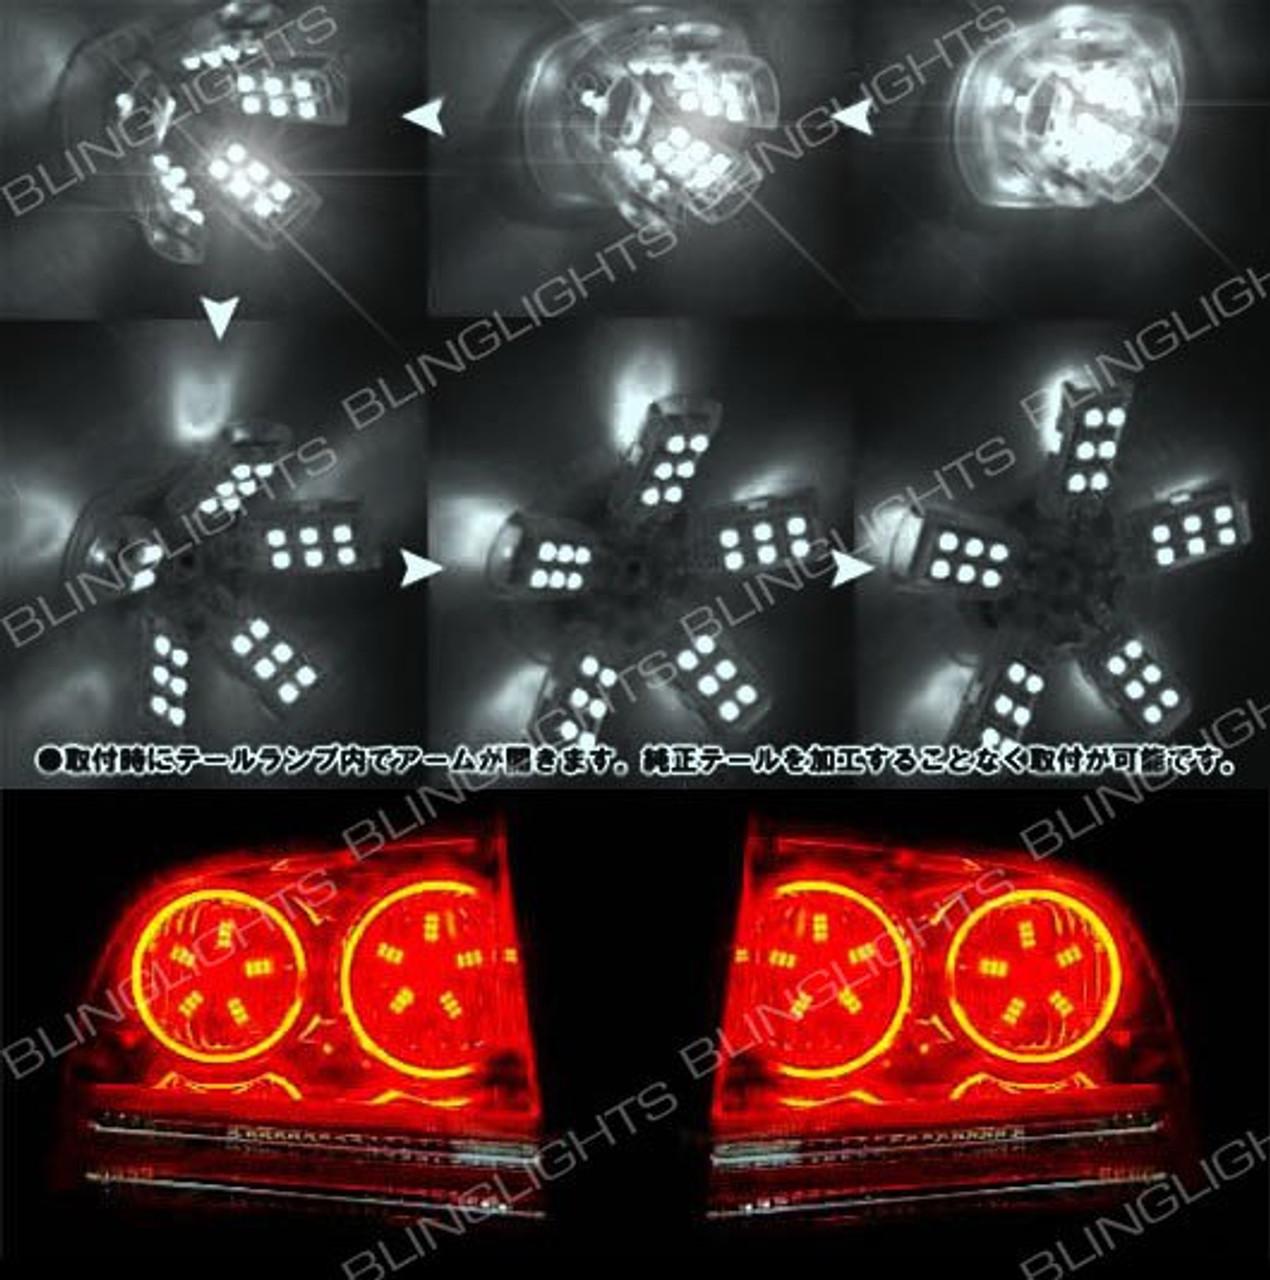 Toyota Highlander Custom LED Tail Lamps Light Bulbs Set